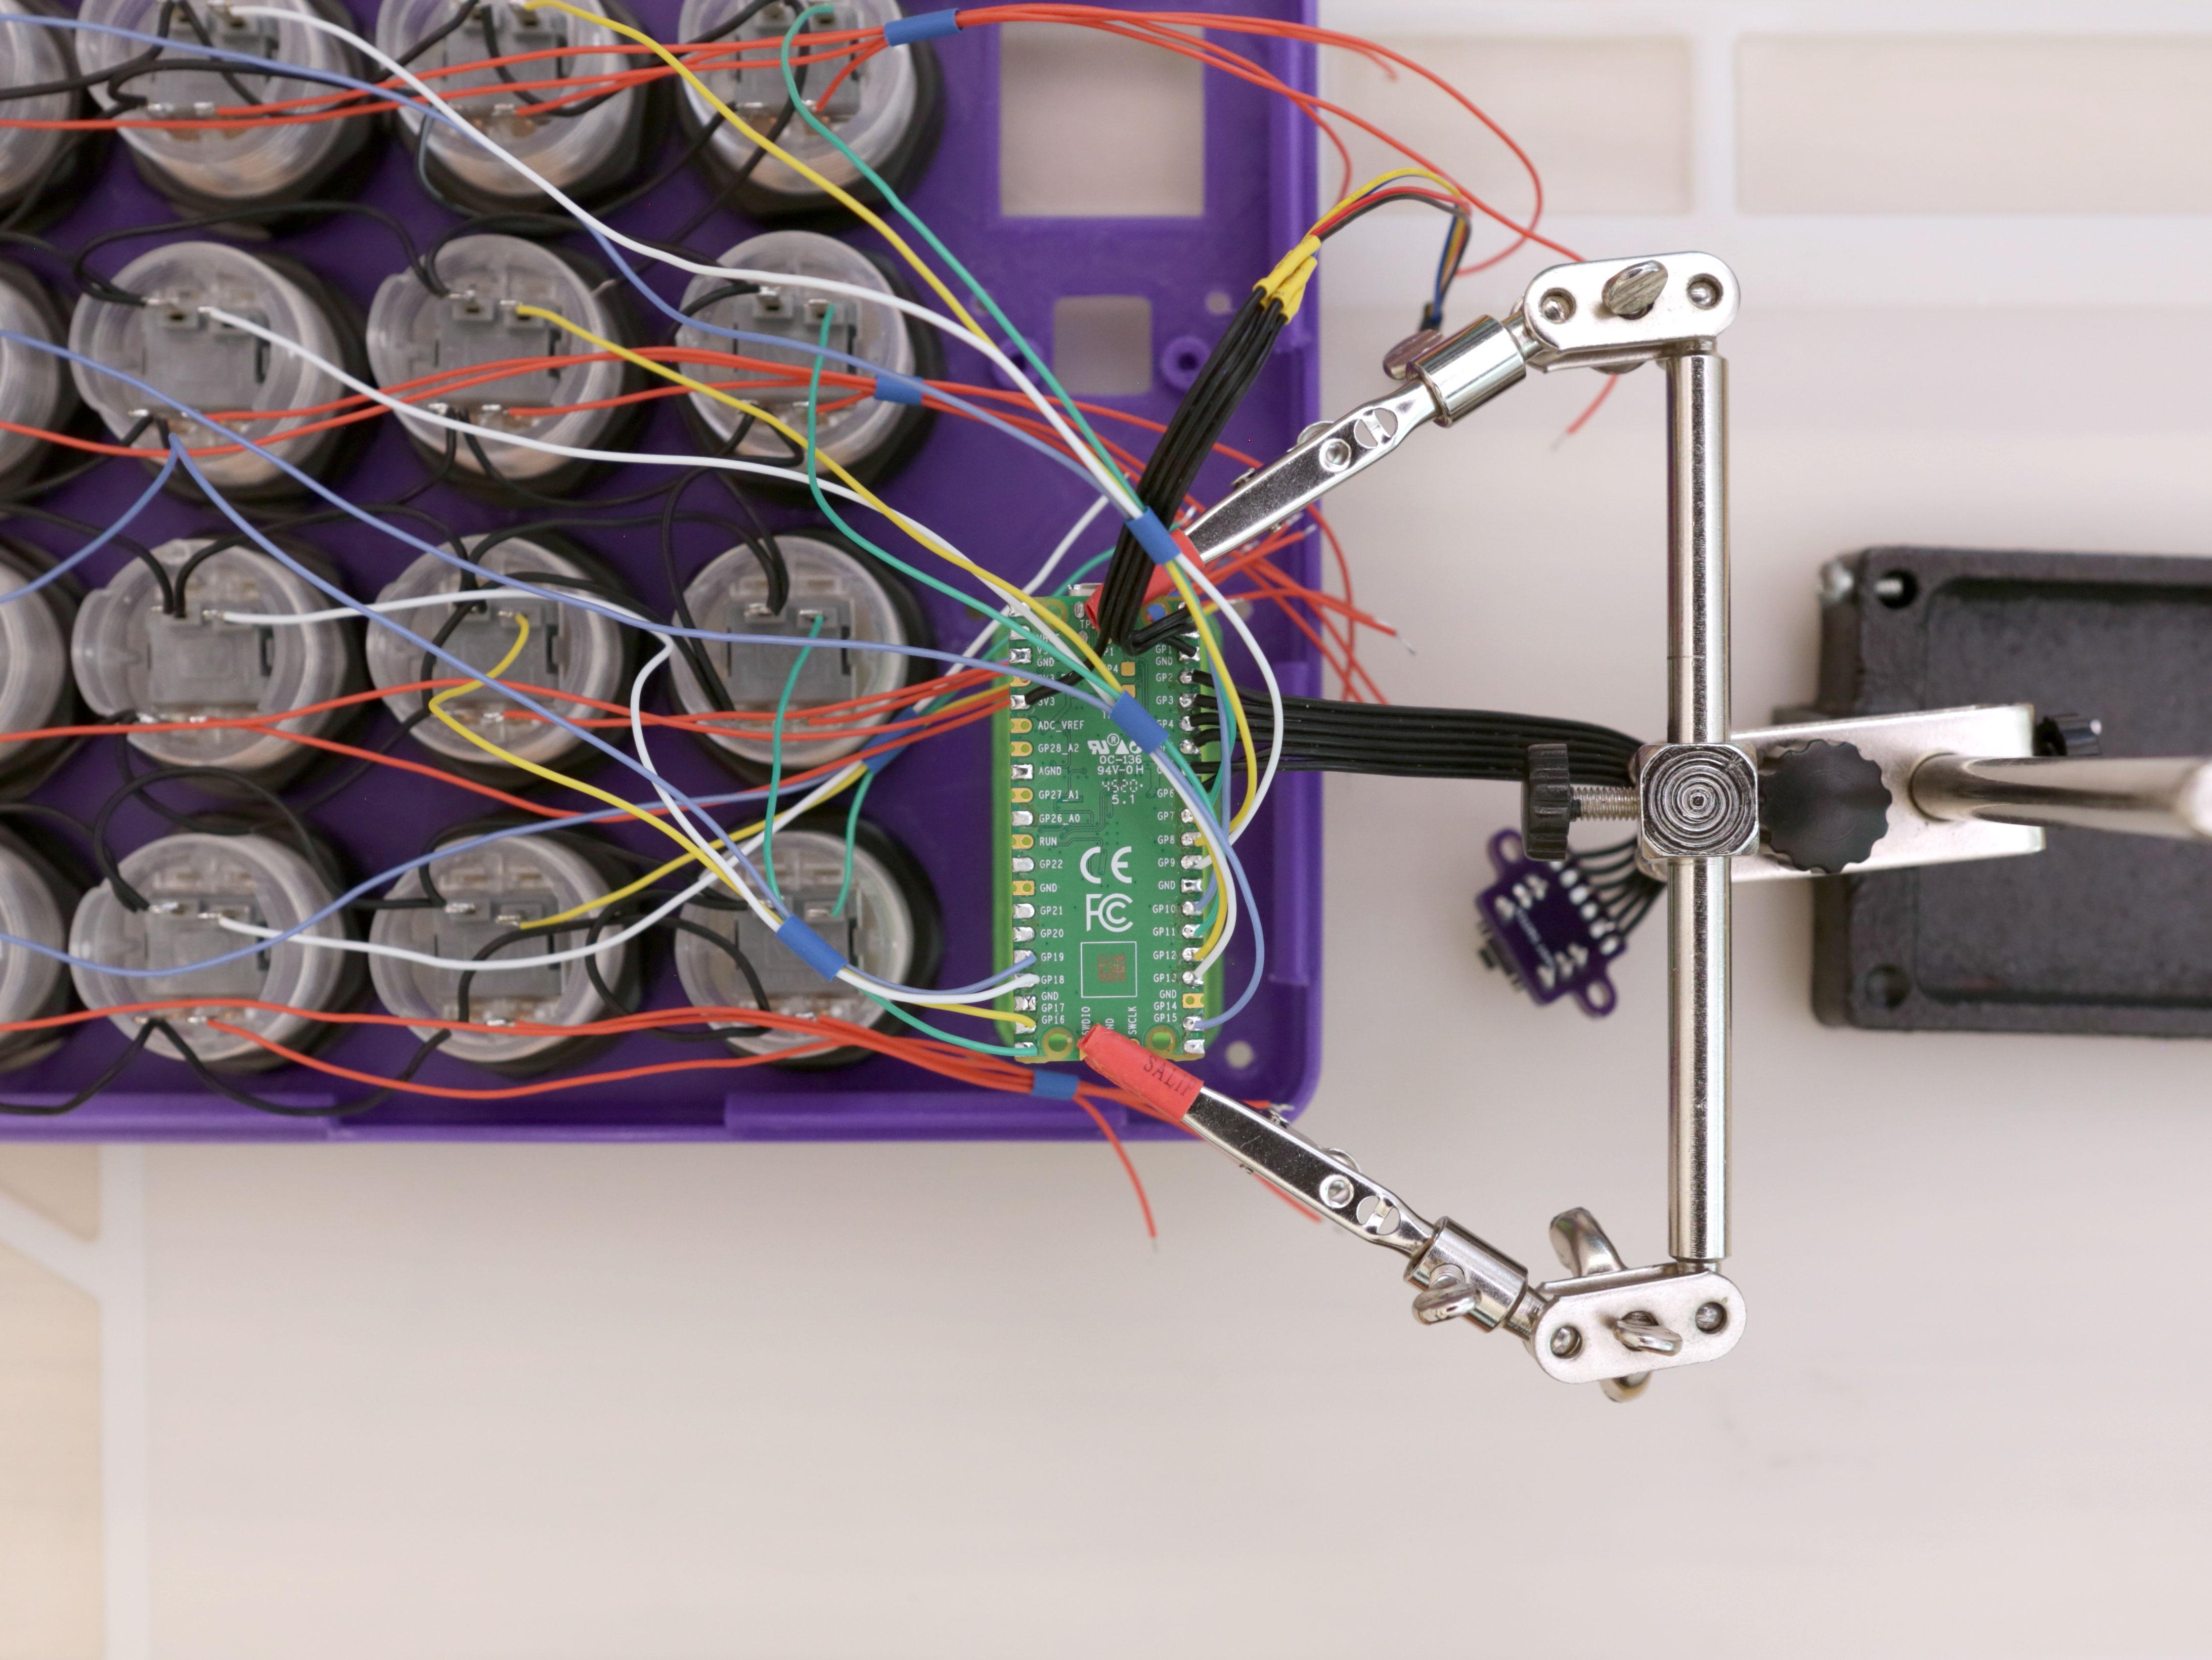 3d_printing_pico-buttons-9-12.jpg